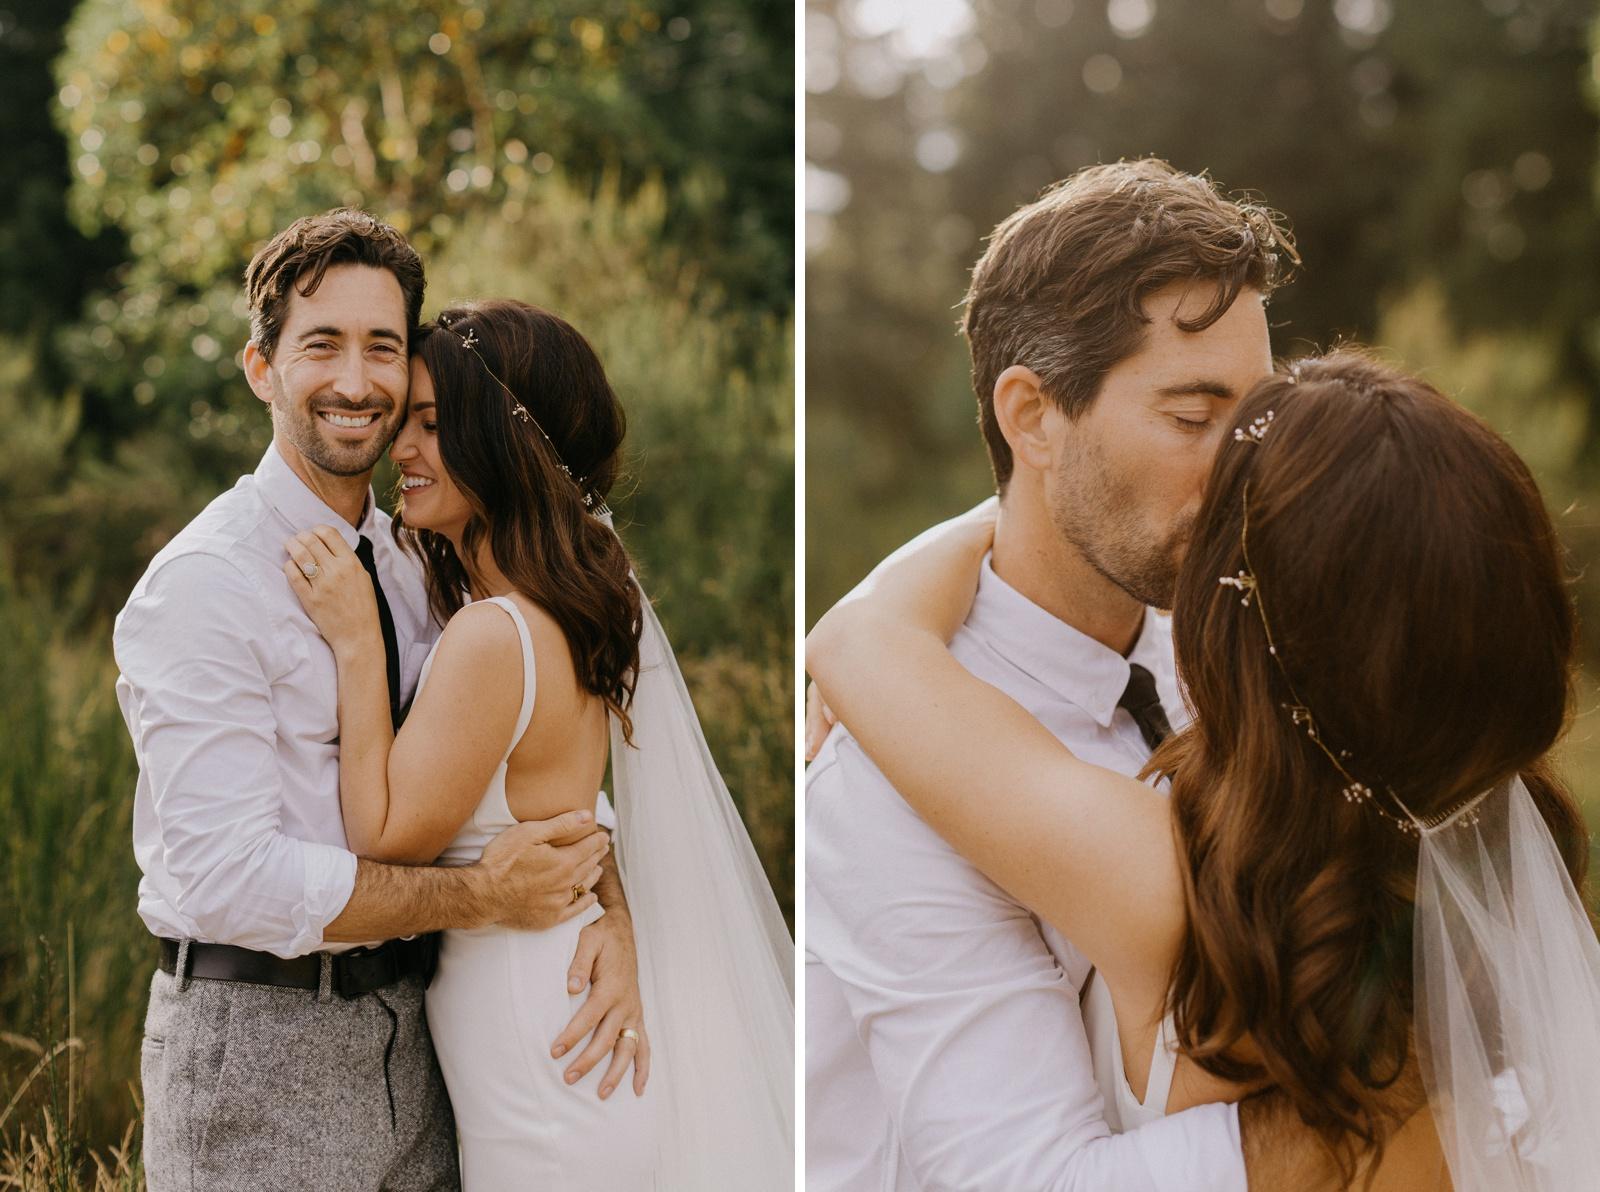 Matthew and Autumn Intimate Outdoor Backyard Wedding_0164